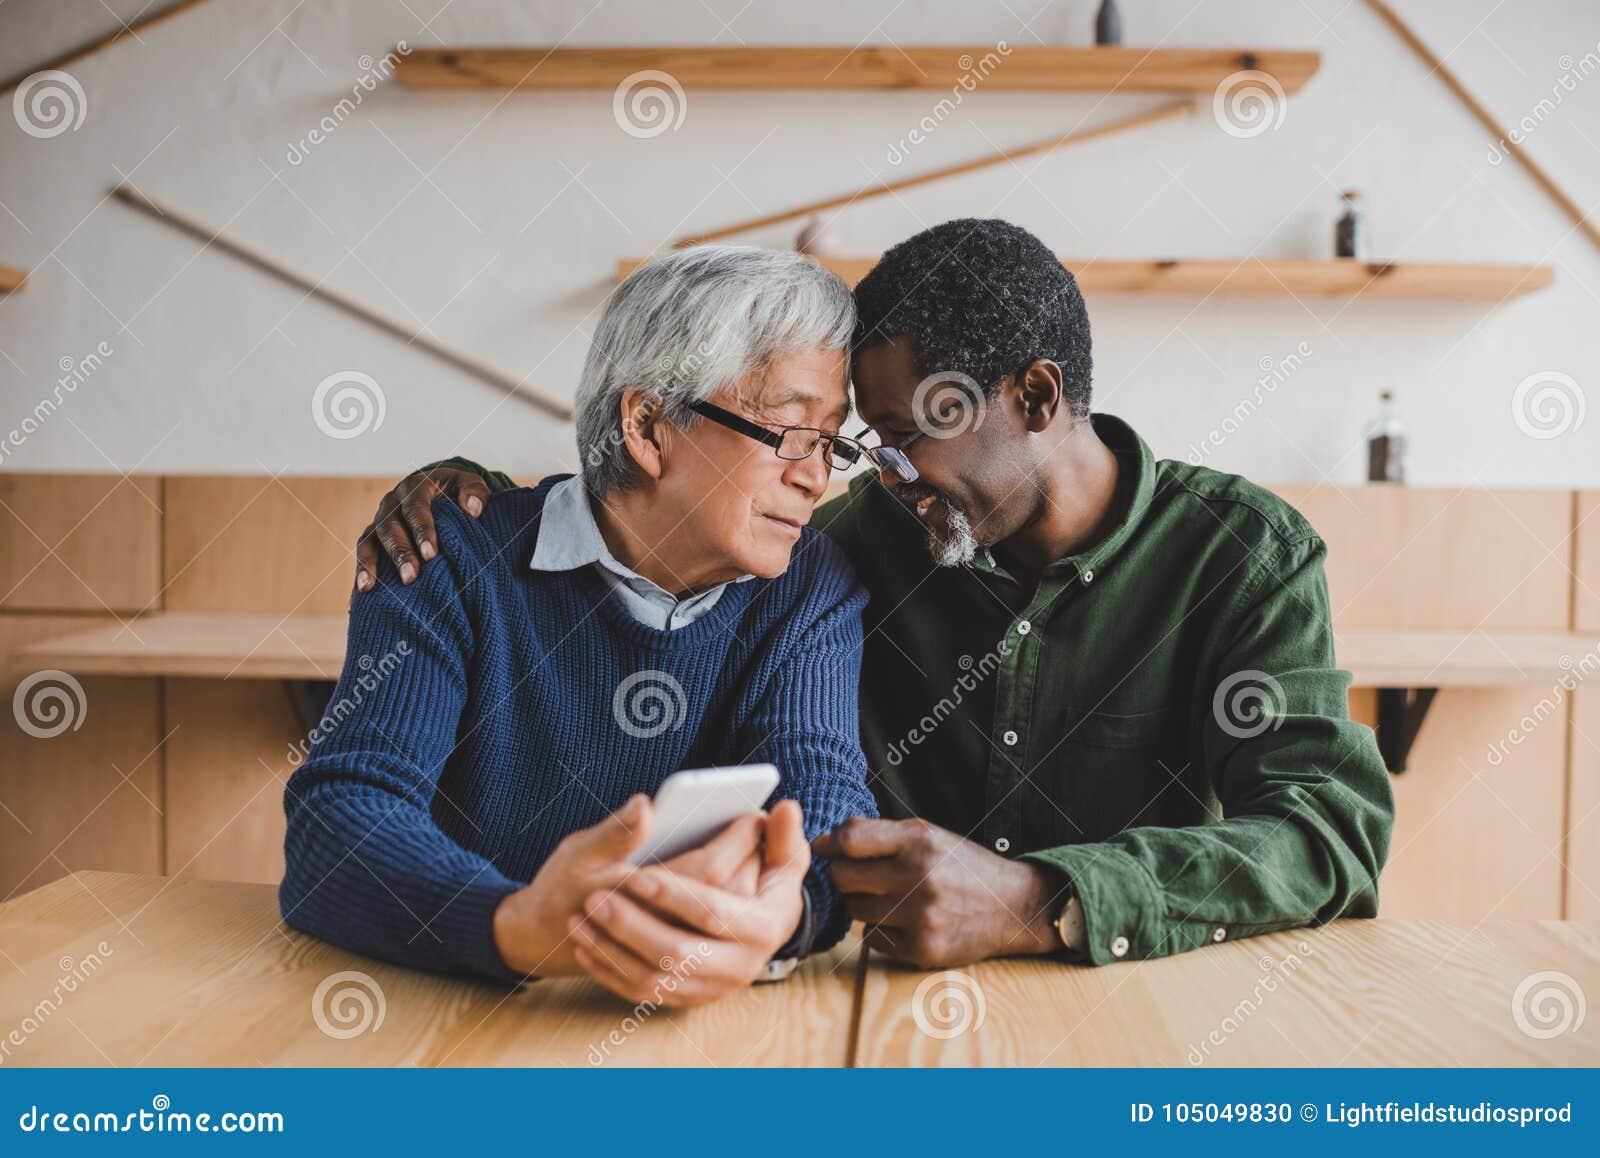 Senior men embracing